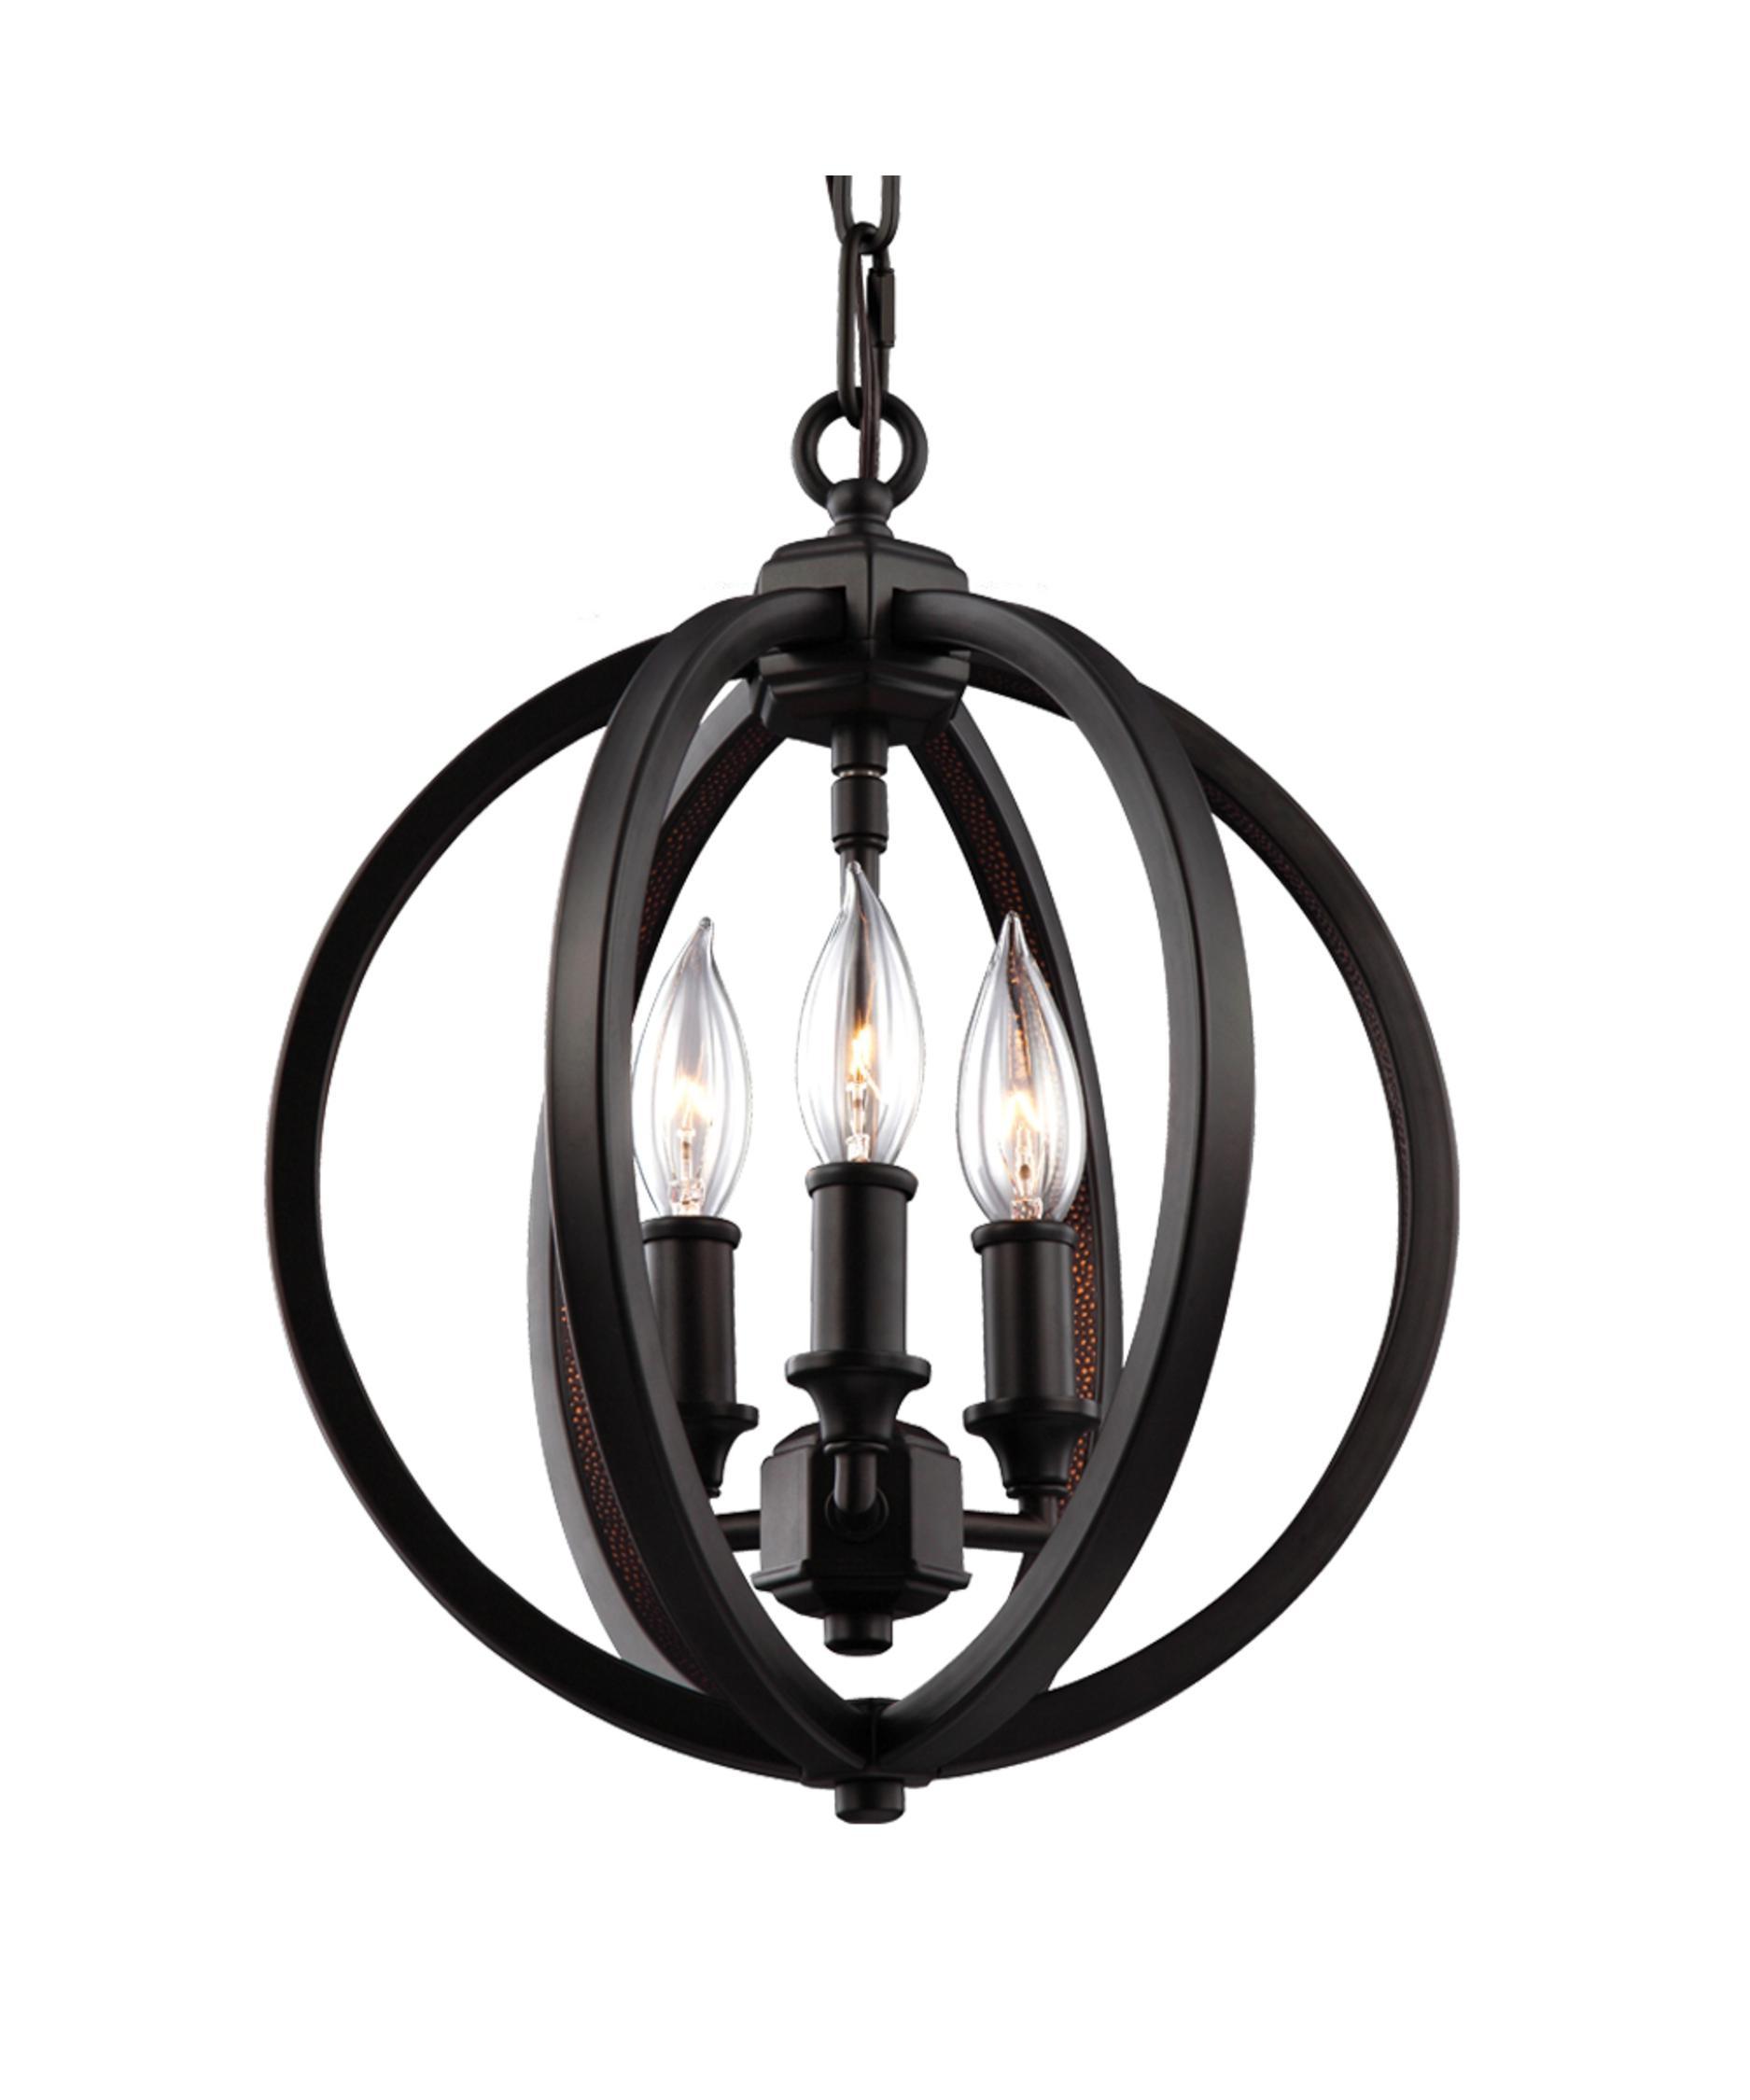 murray feiss f30593 corinne 11 inch wide 3 light mini chandelier capitol lighting - Feiss Lighting